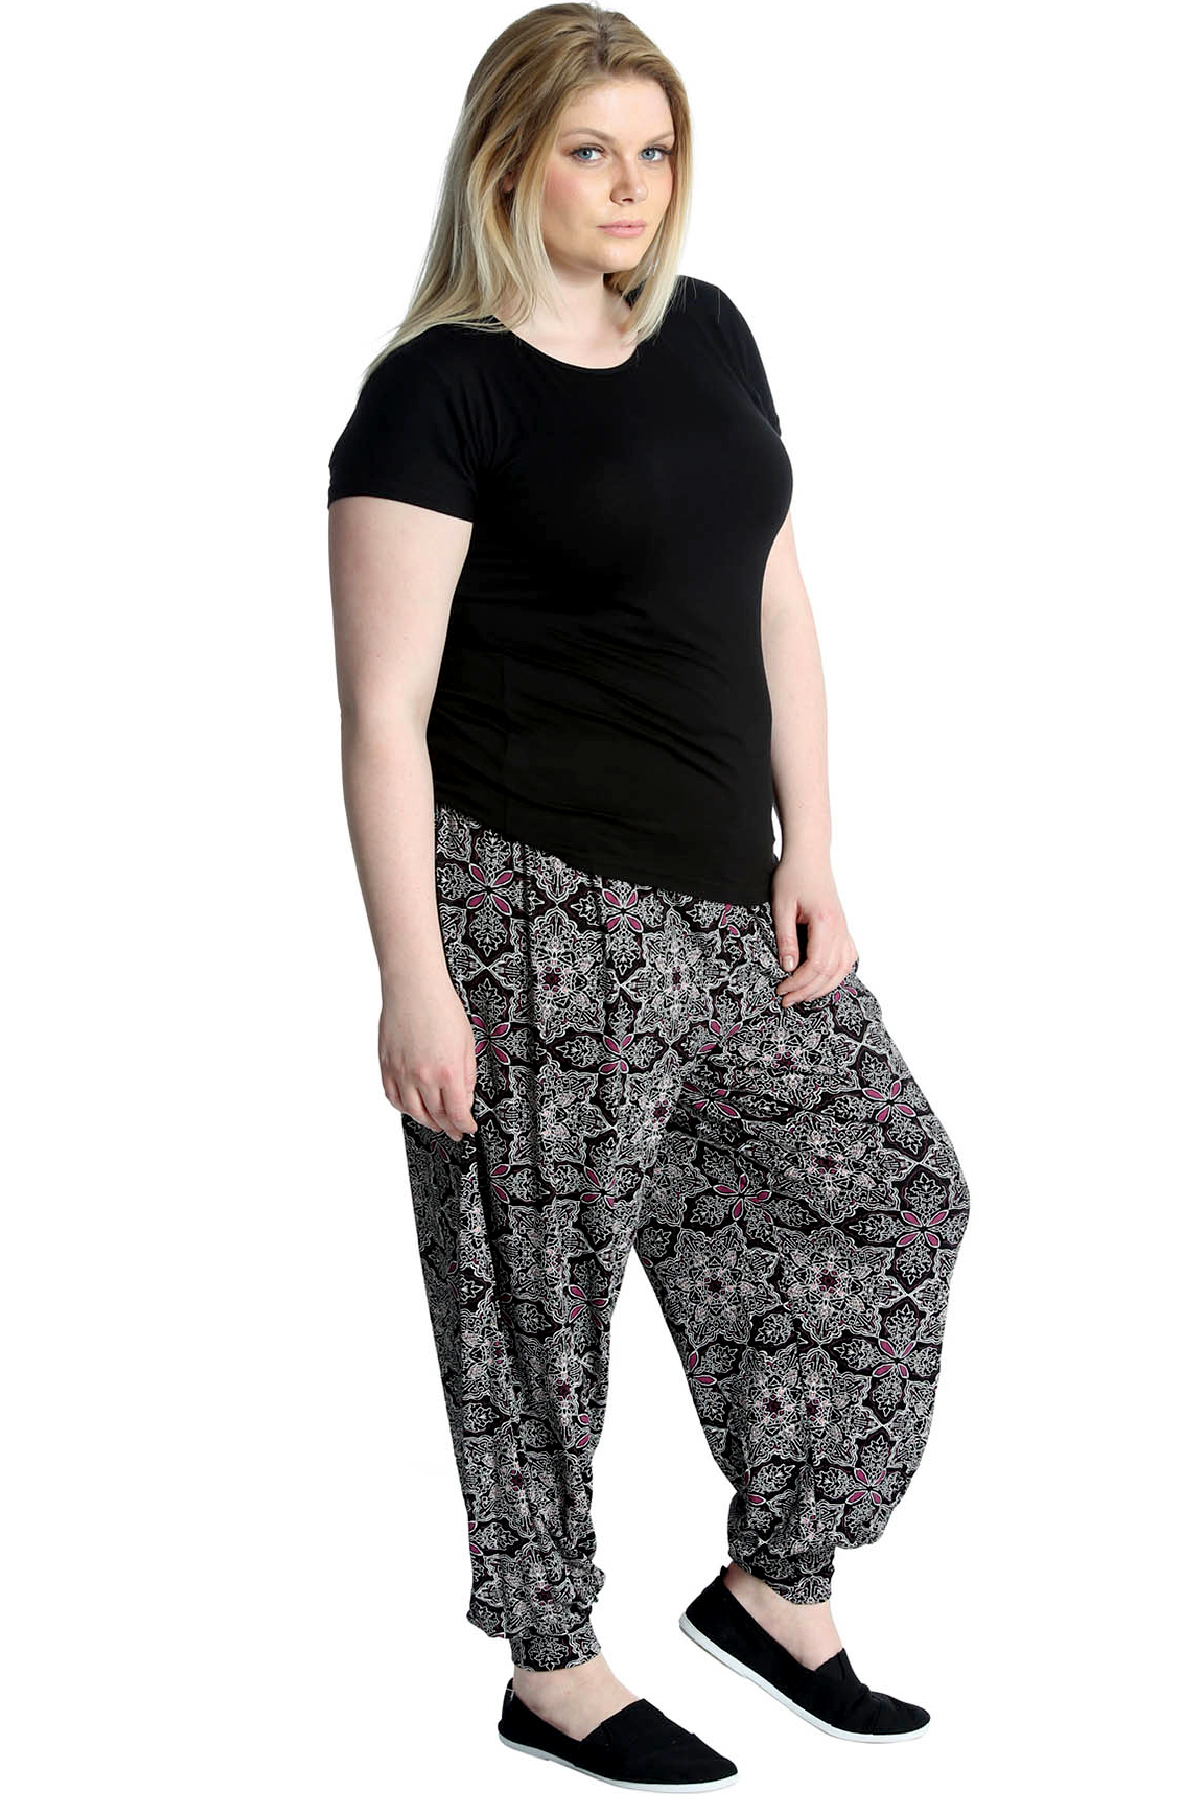 New Women Harem Plus Size Ladies Ali Baba Moroccan Print Cuffed Trouser Nouvelle